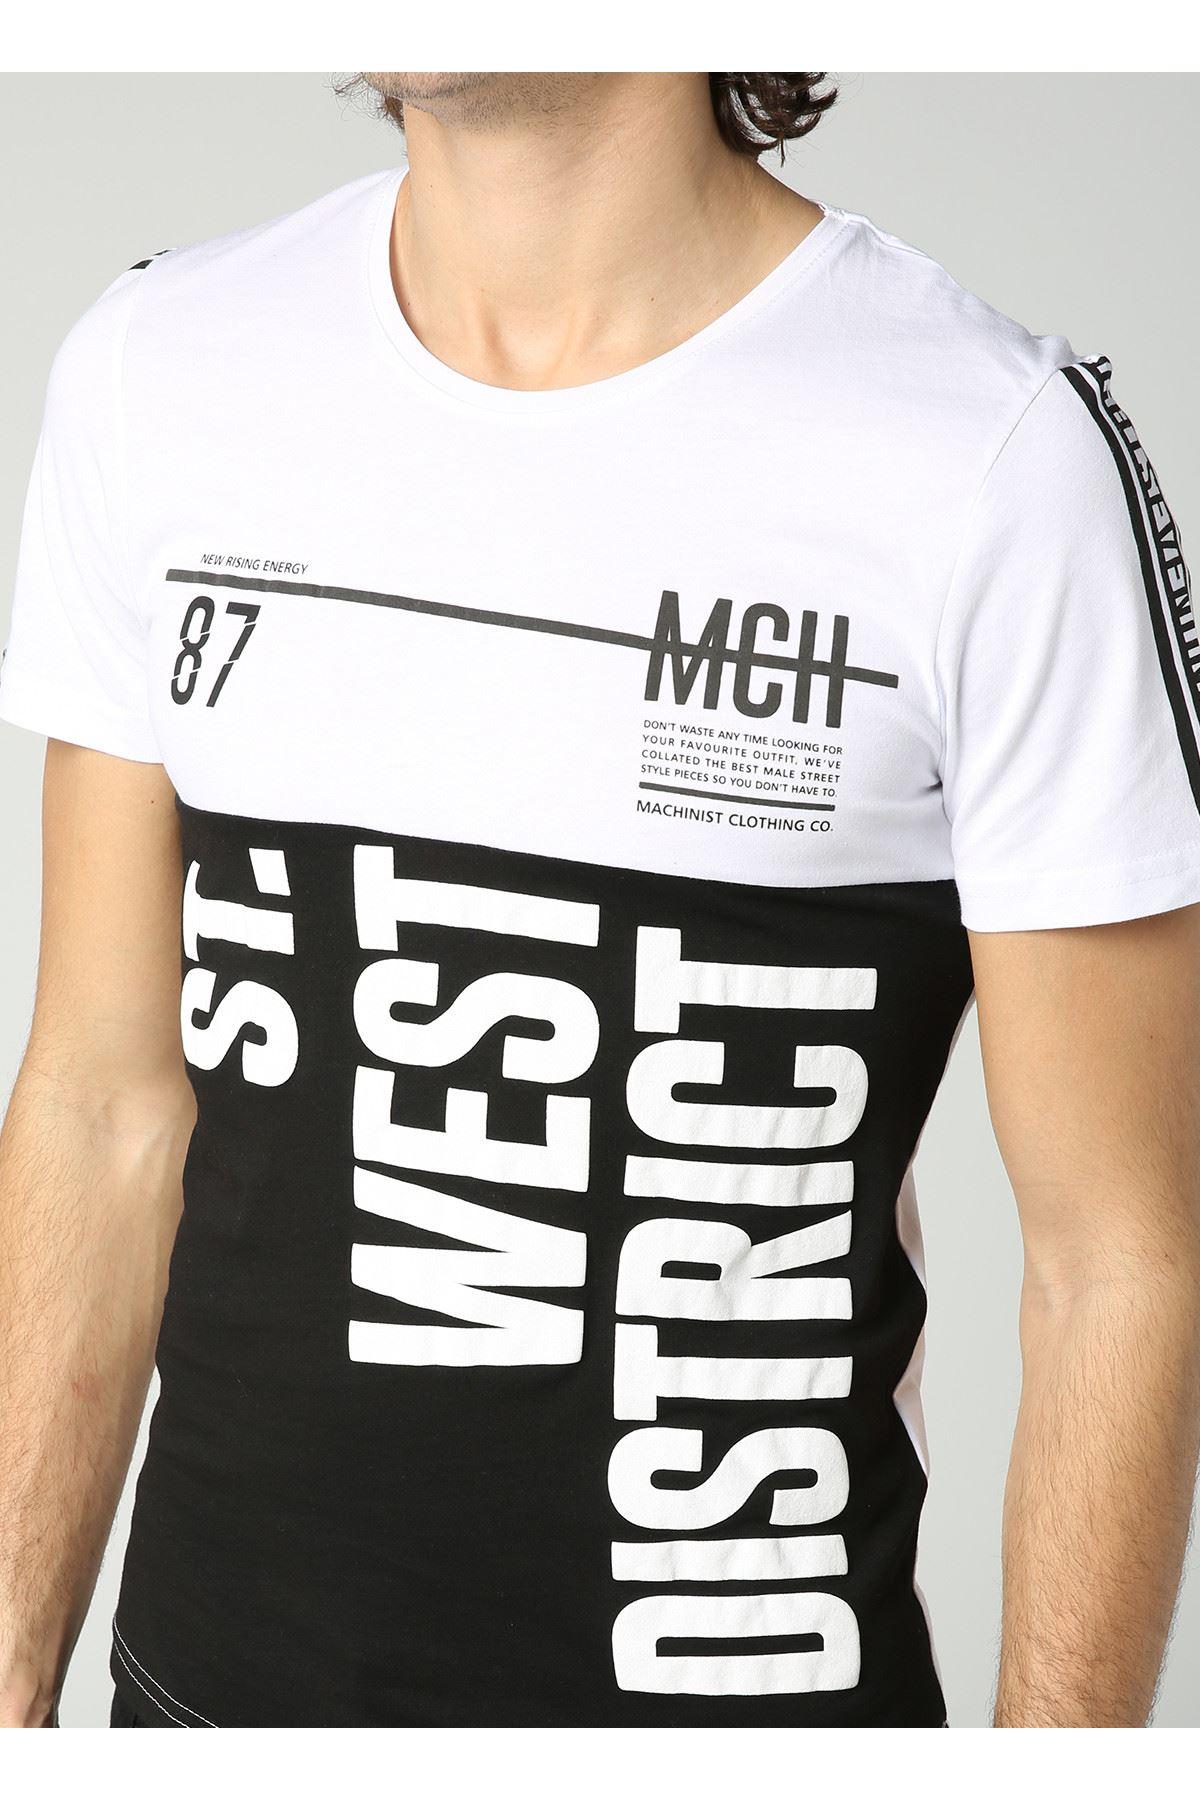 Bisiklet Yaka West Baskılı Siyah Beyaz Erkek T-Shirt